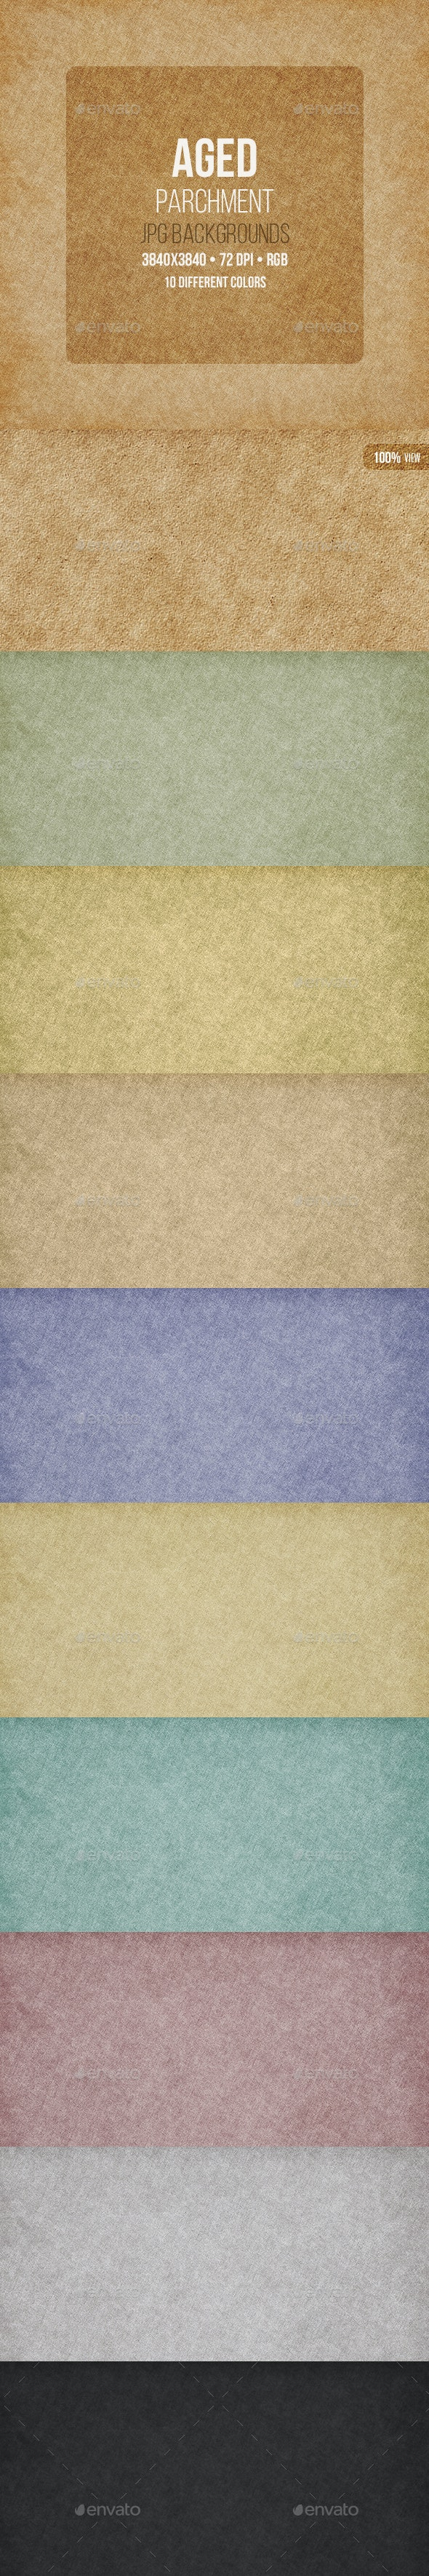 Aged Parchment Backgrounds - Patterns Backgrounds